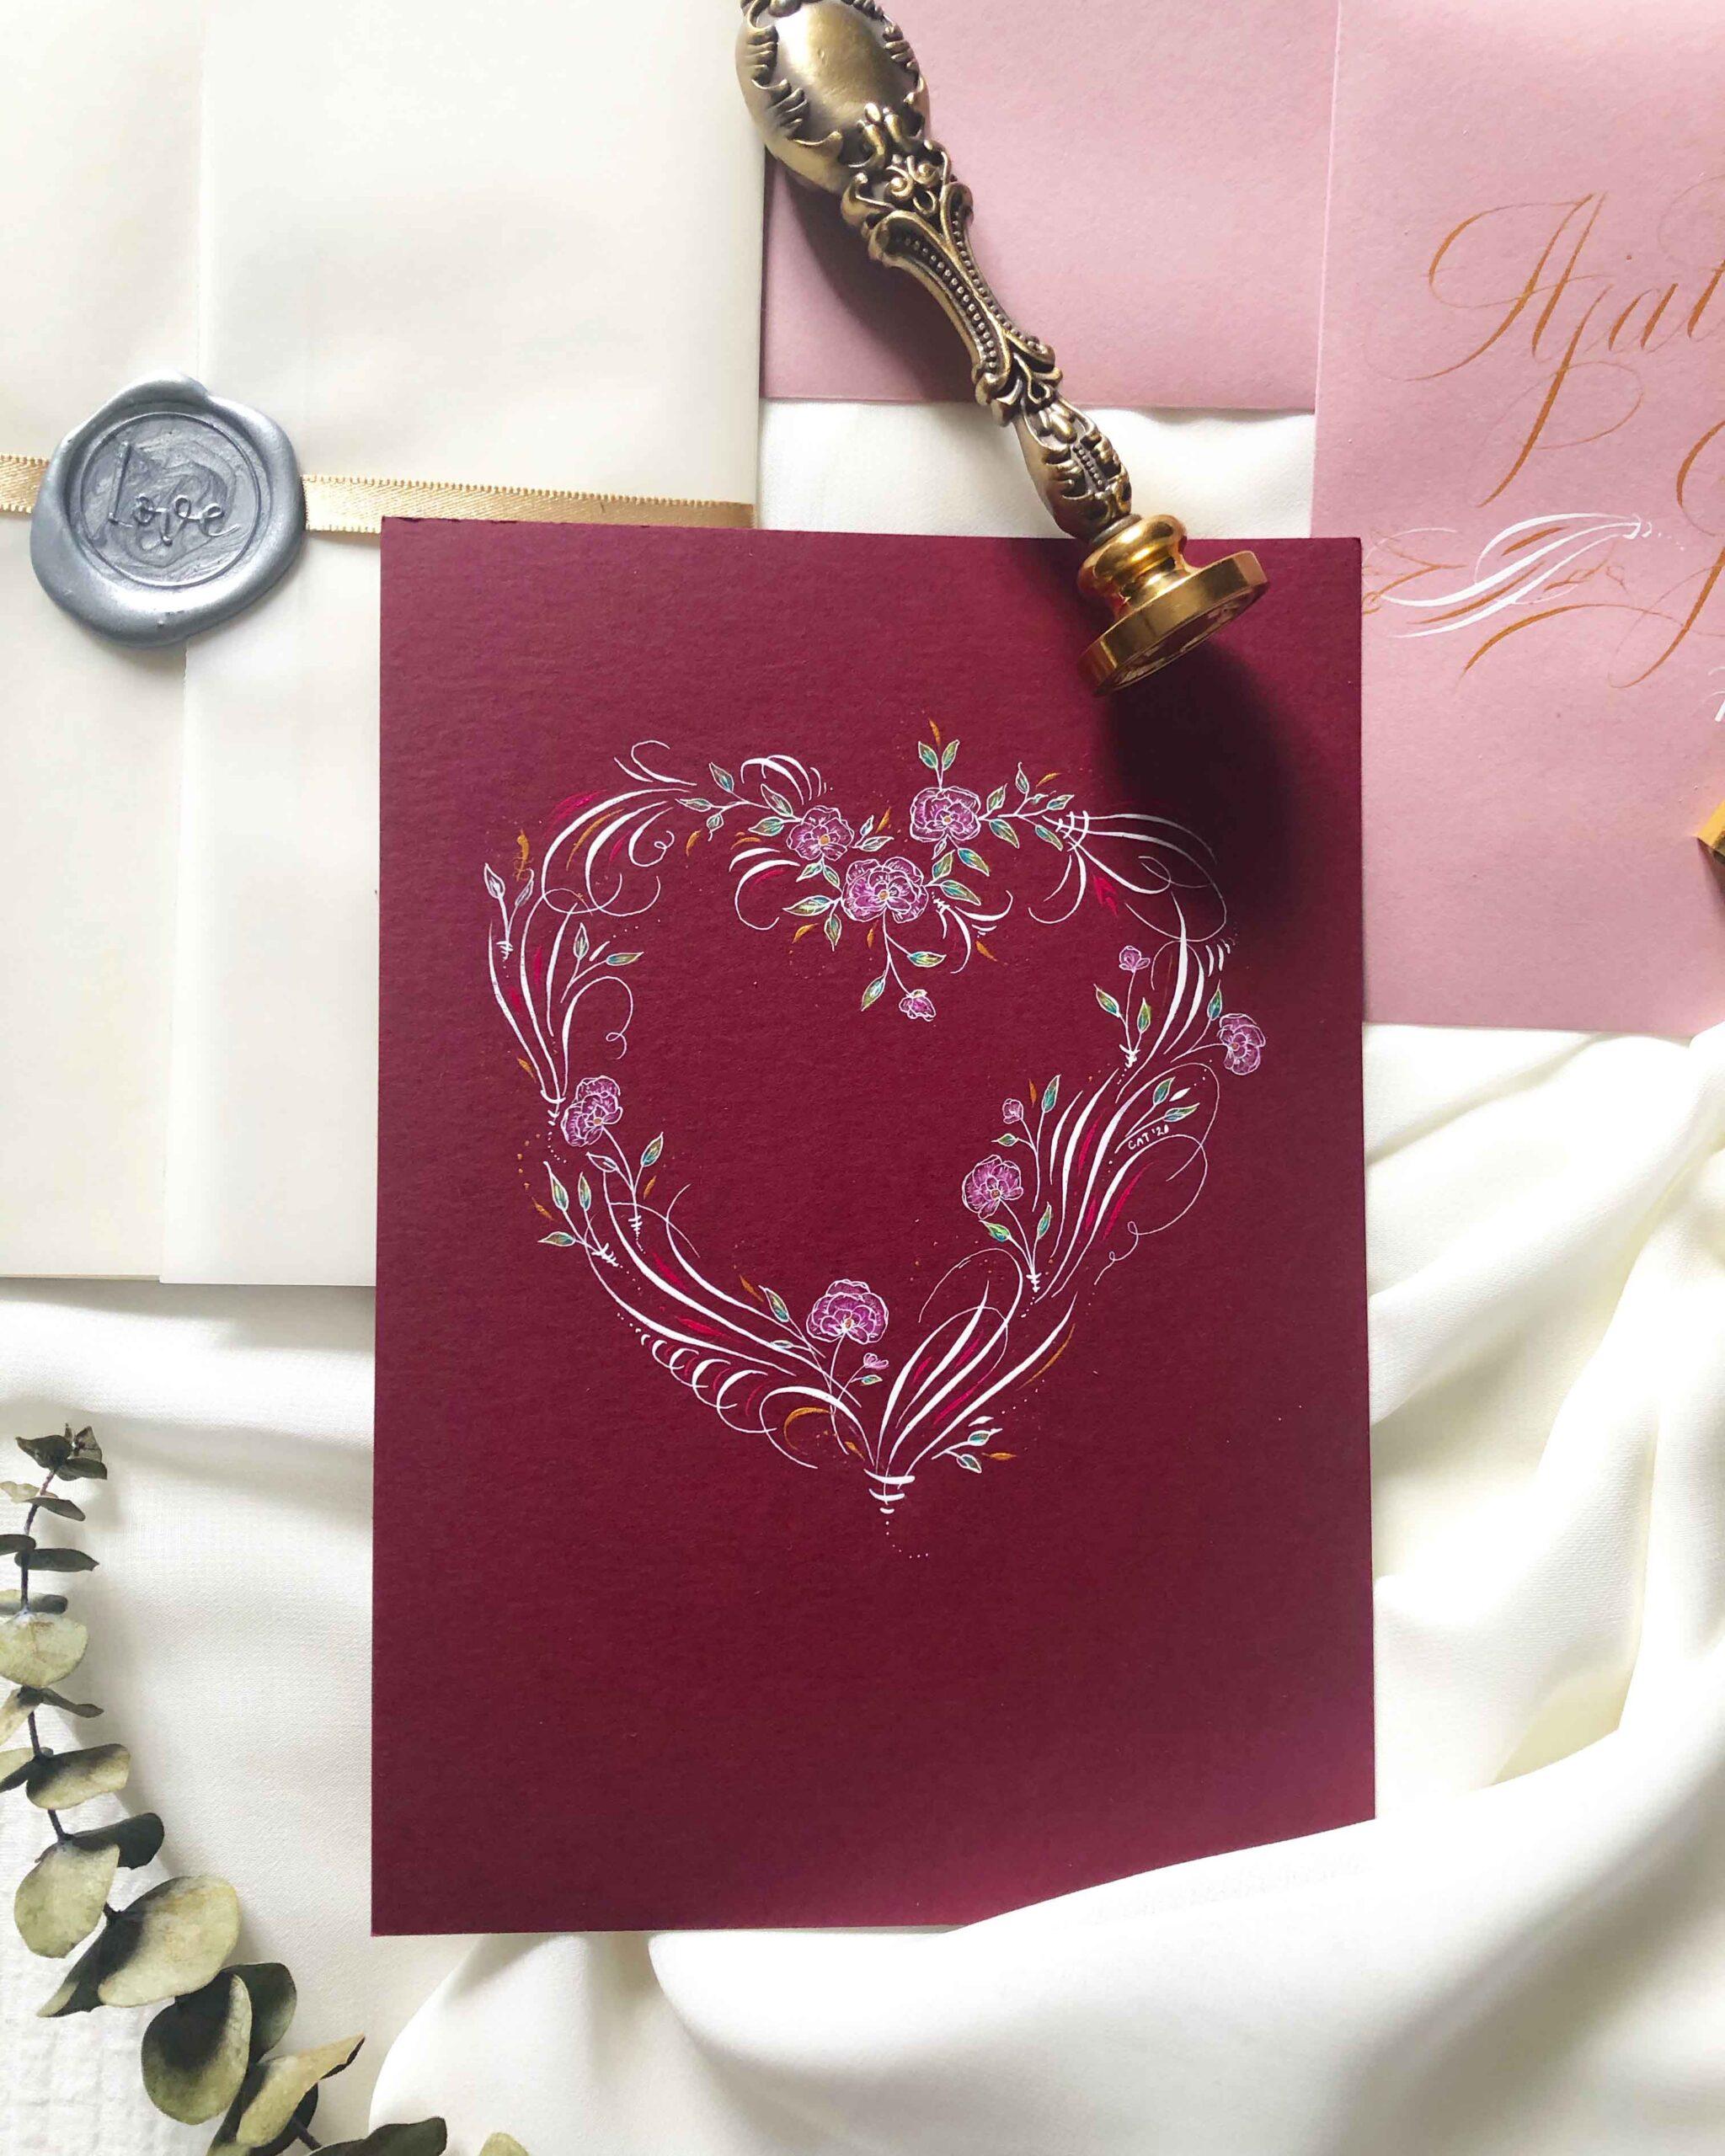 Allocco Design Norfolk, VA Calligraphy | Flourished Heart